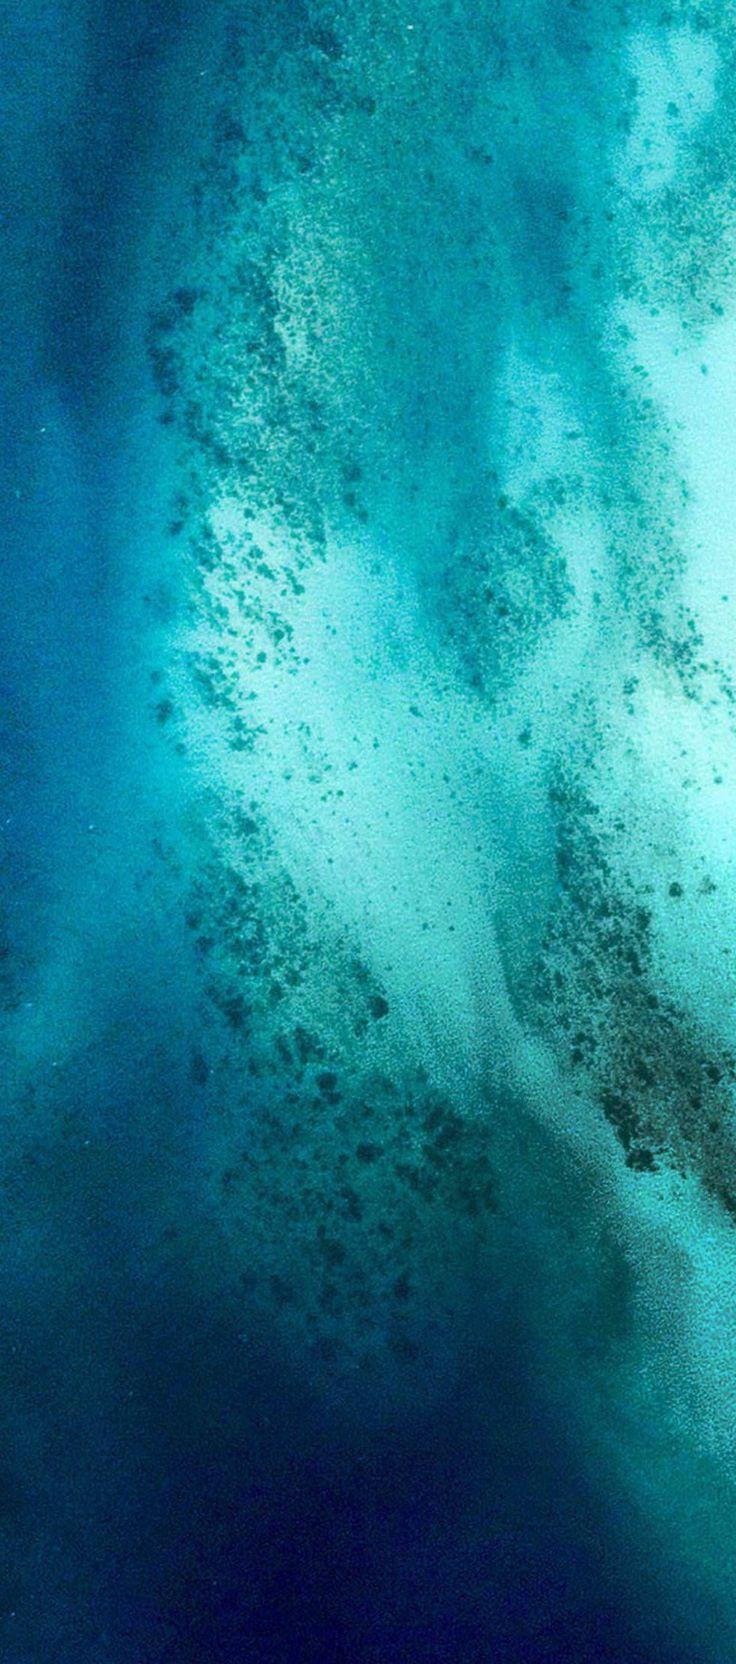 Ios 11 Iphone X Aqua Blue Water Wave Ocean Apple Wallpaper